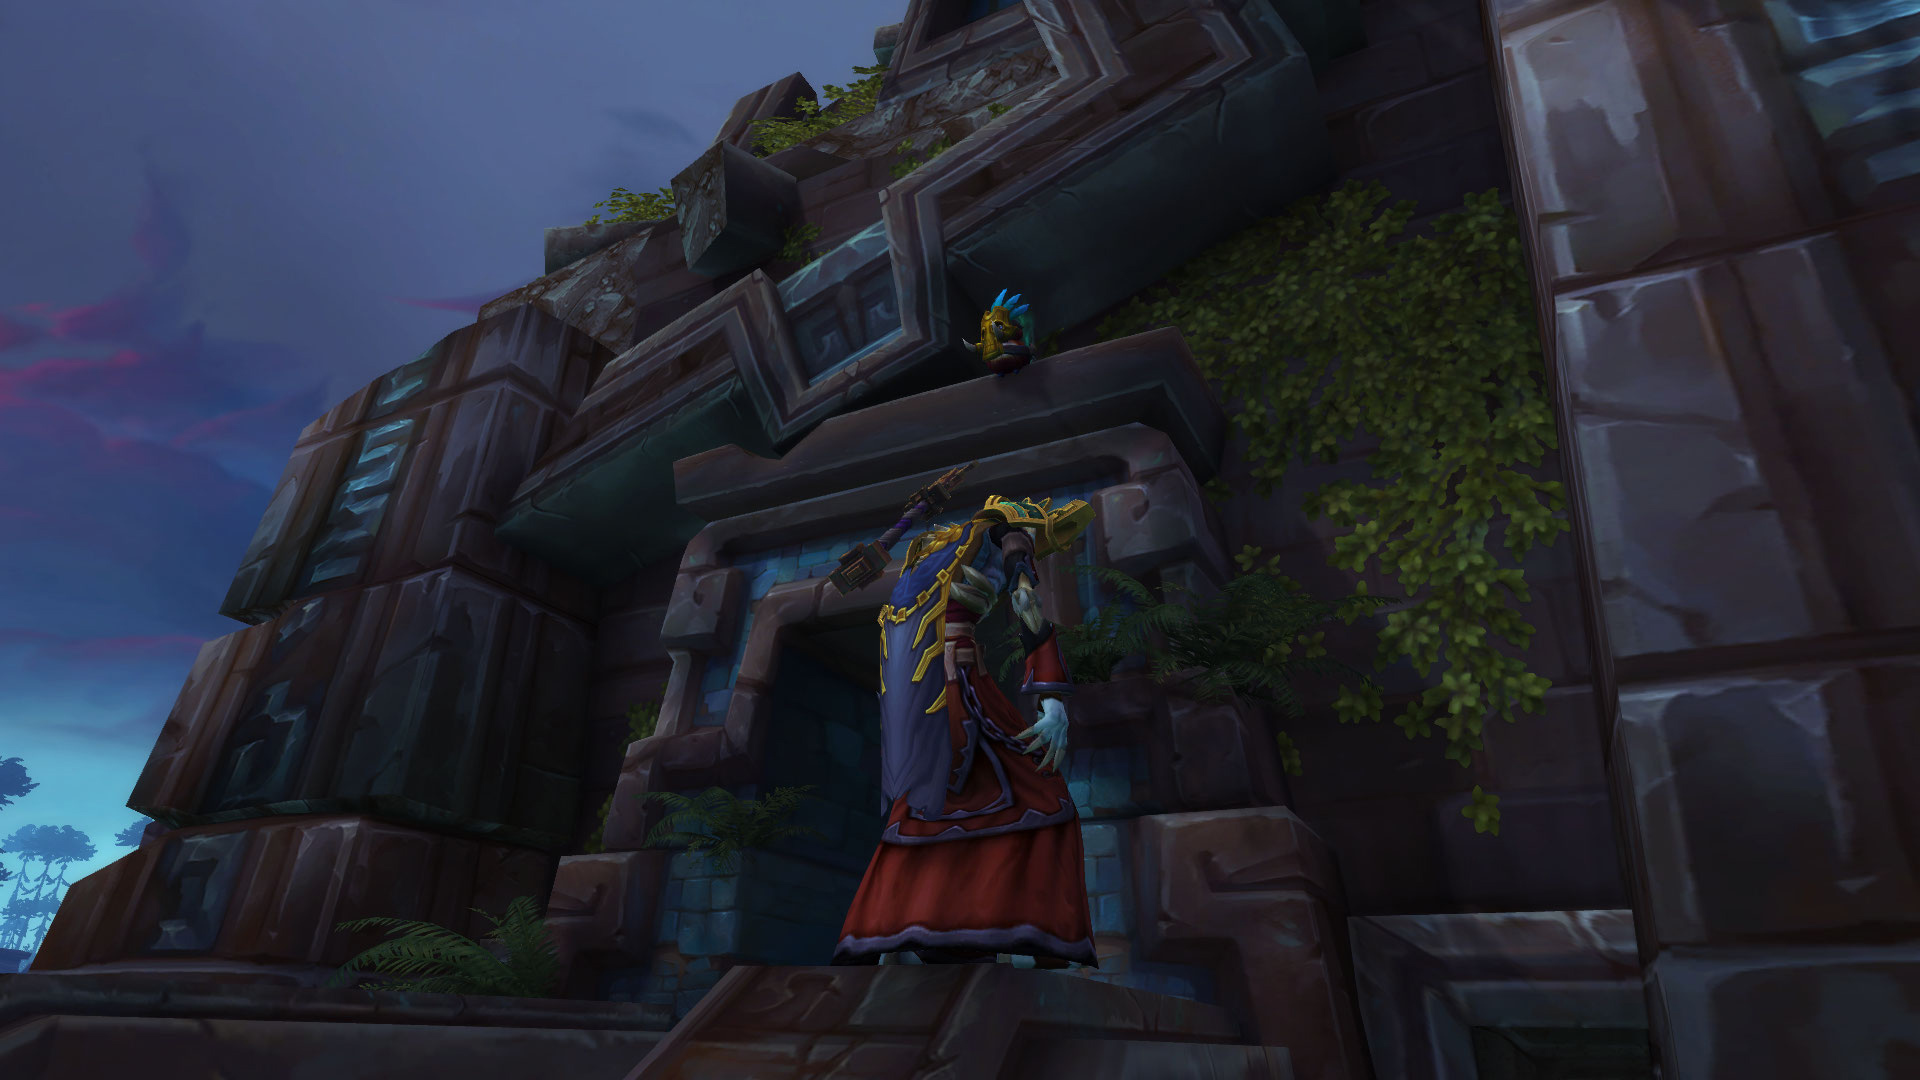 Screenshot de World of Warcraft: Battle for Azeroth réalisé par Fozzy.